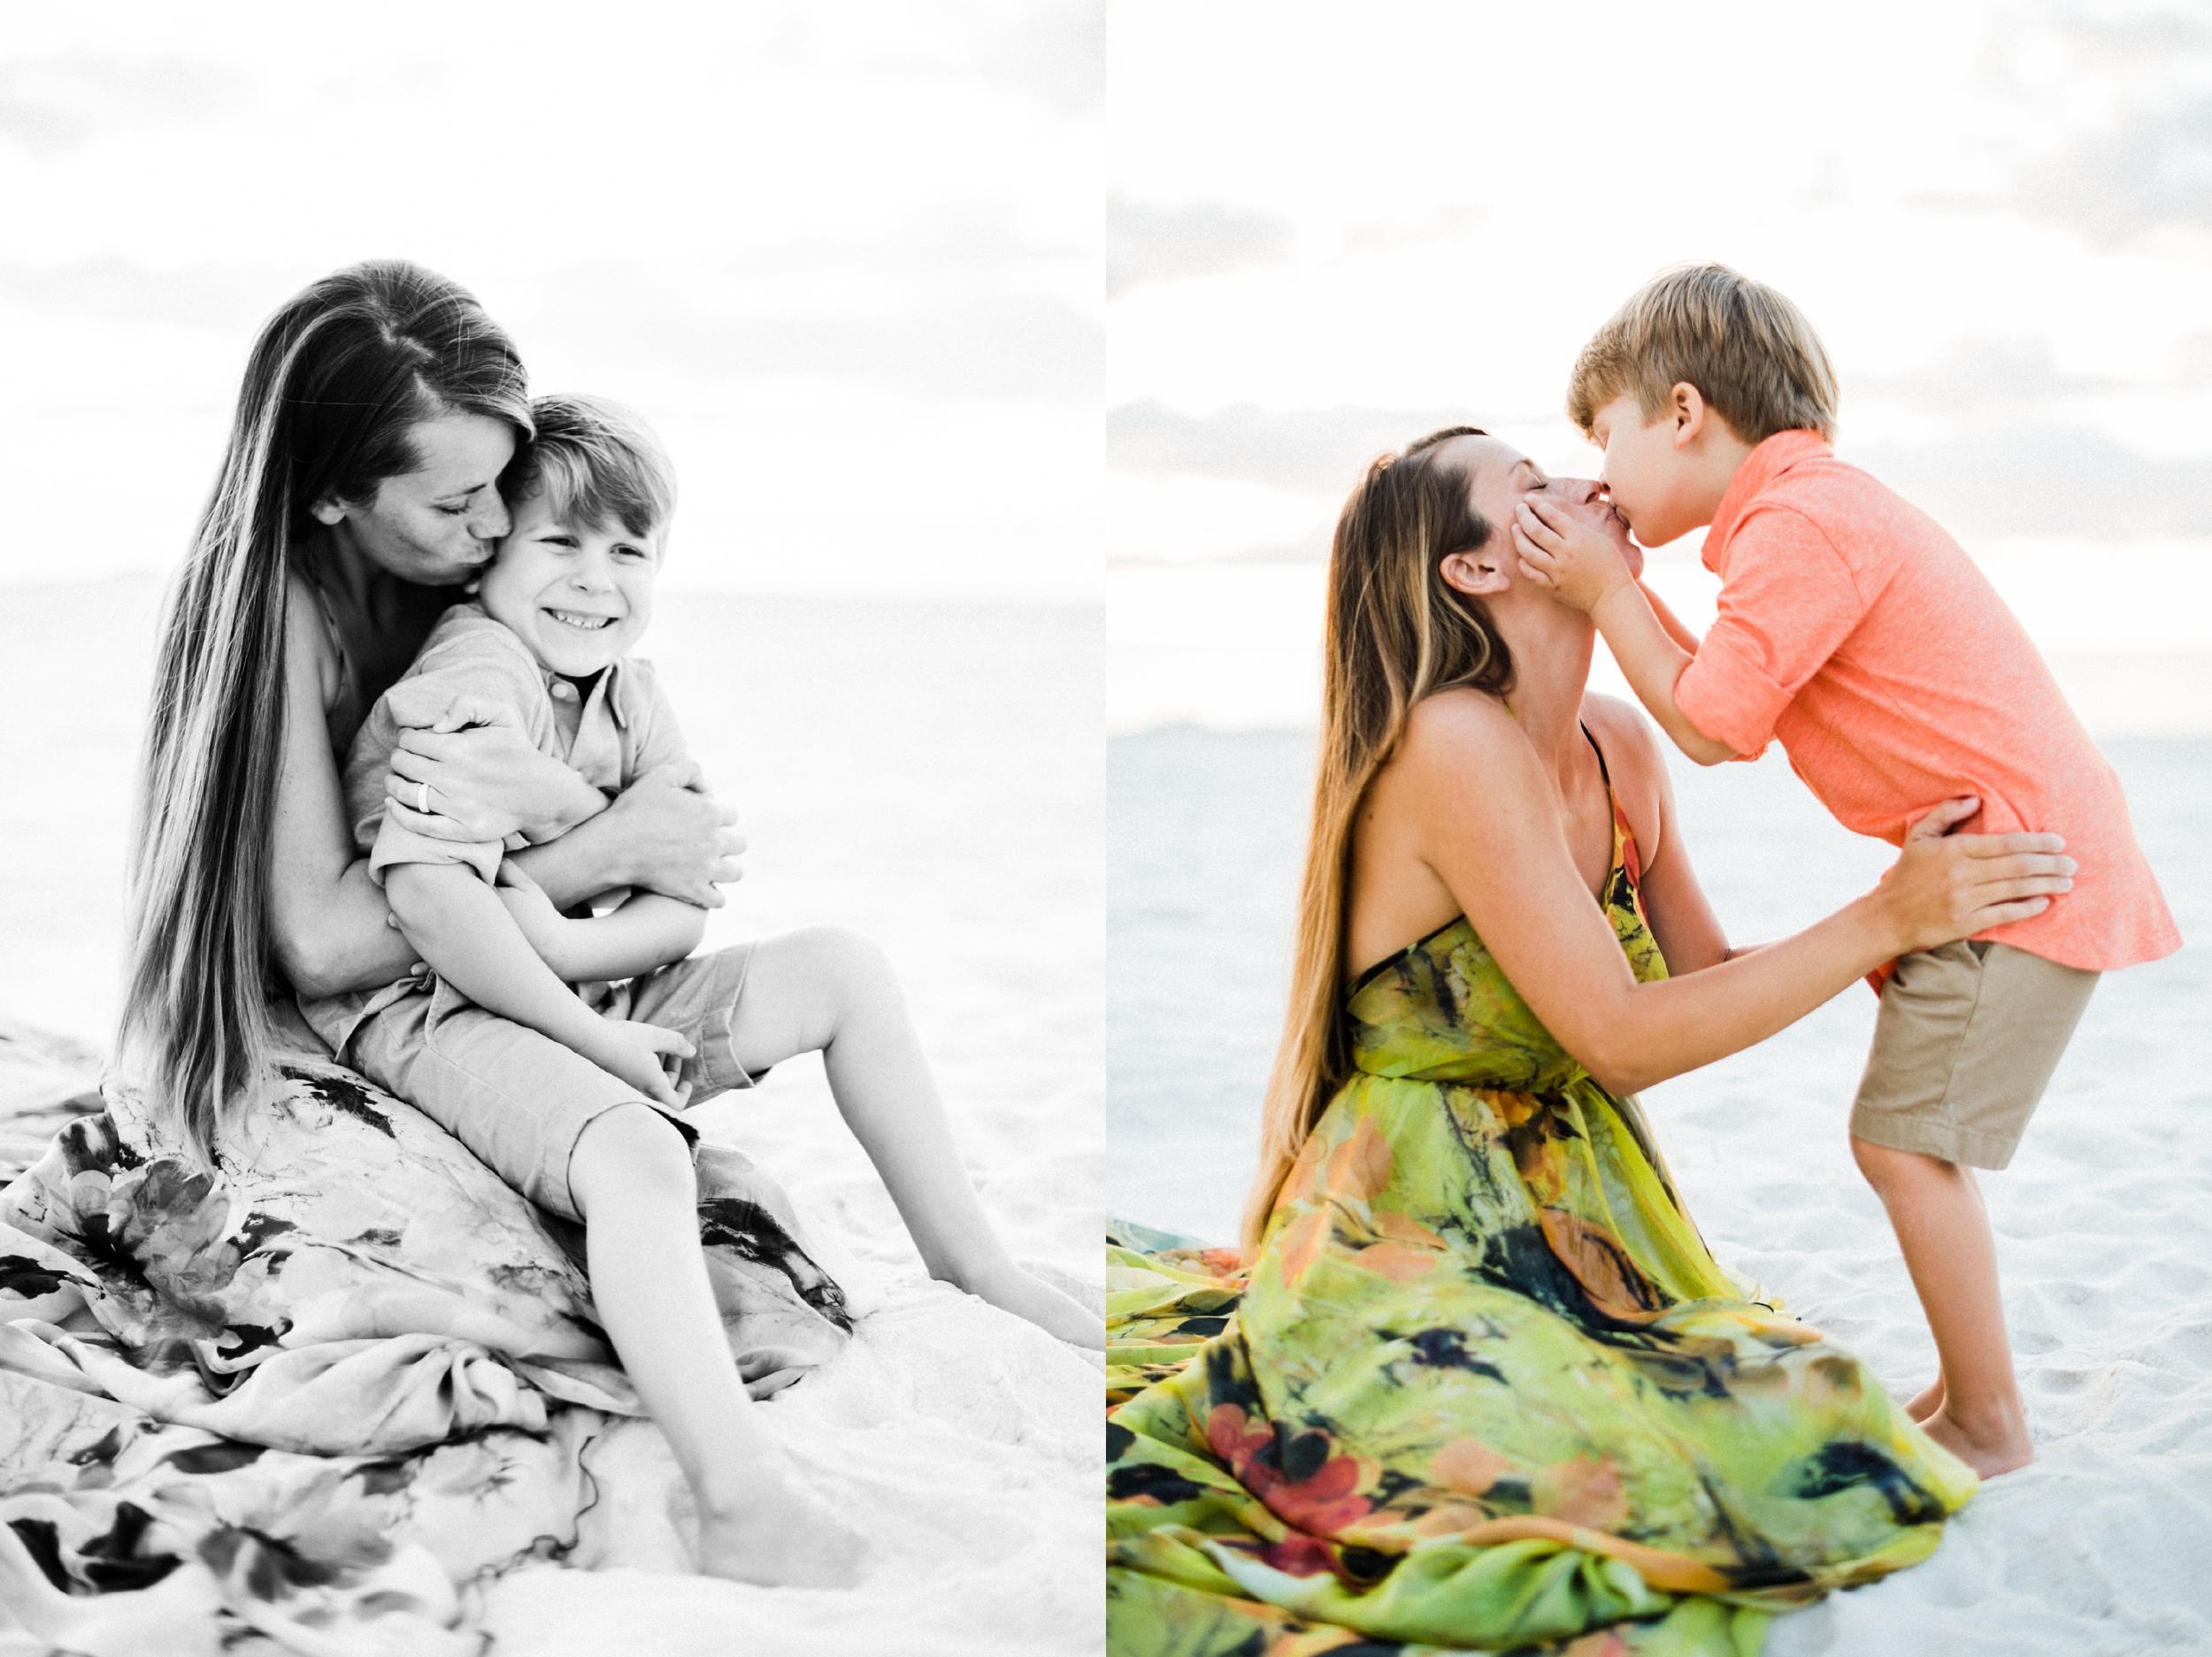 desiree-gardner-photography-pairs-france-monet-garden-monets-couple-wedding-engagement-giverny-30-a-30a-florida_0075.jpg